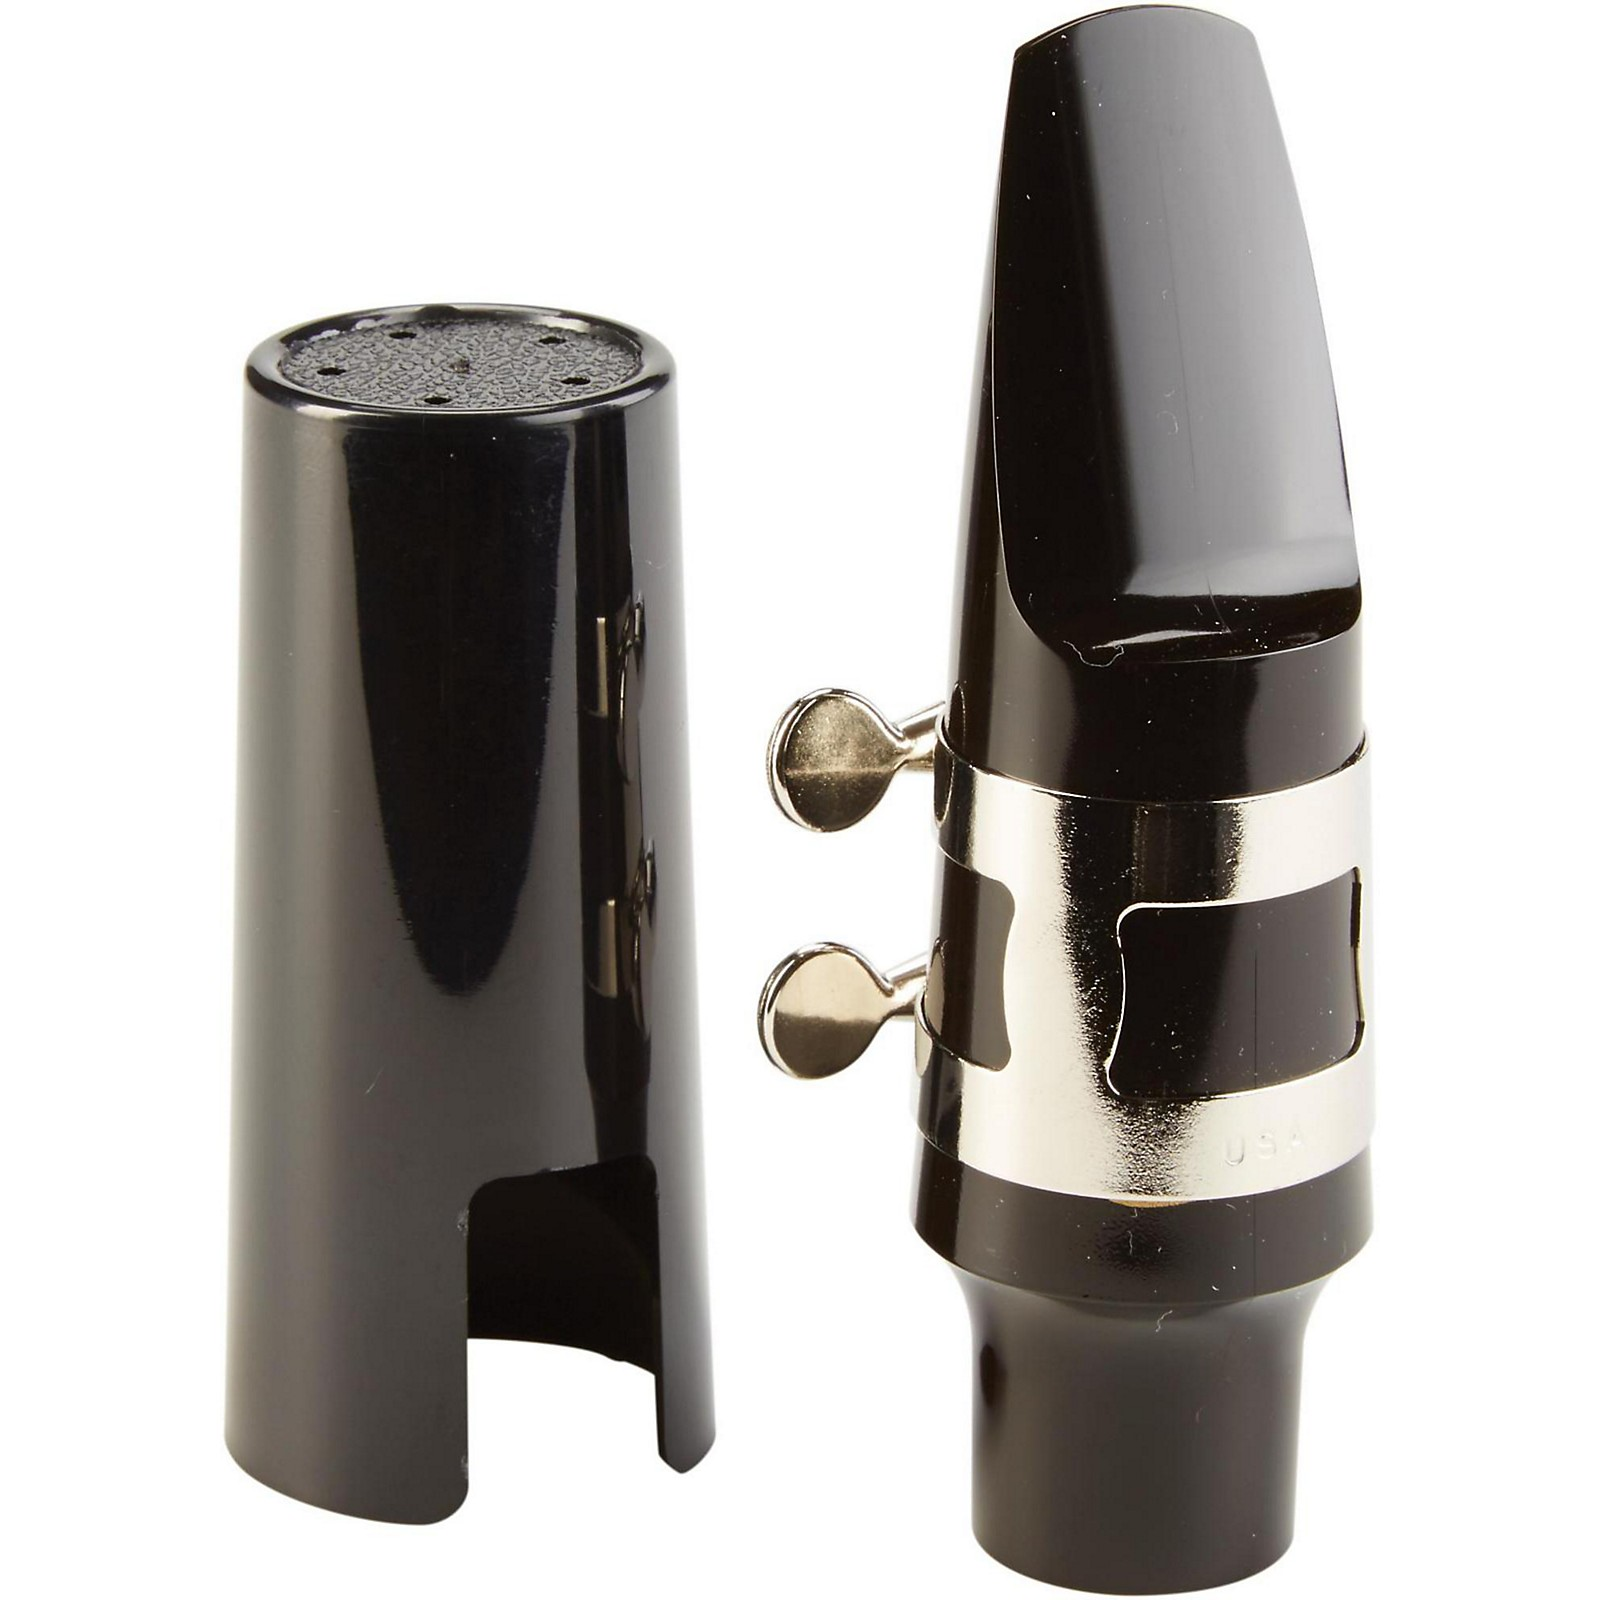 Giardinelli Tenor Saxophone Mouthpiece Kit Includes Mpc, Cap & Ligature